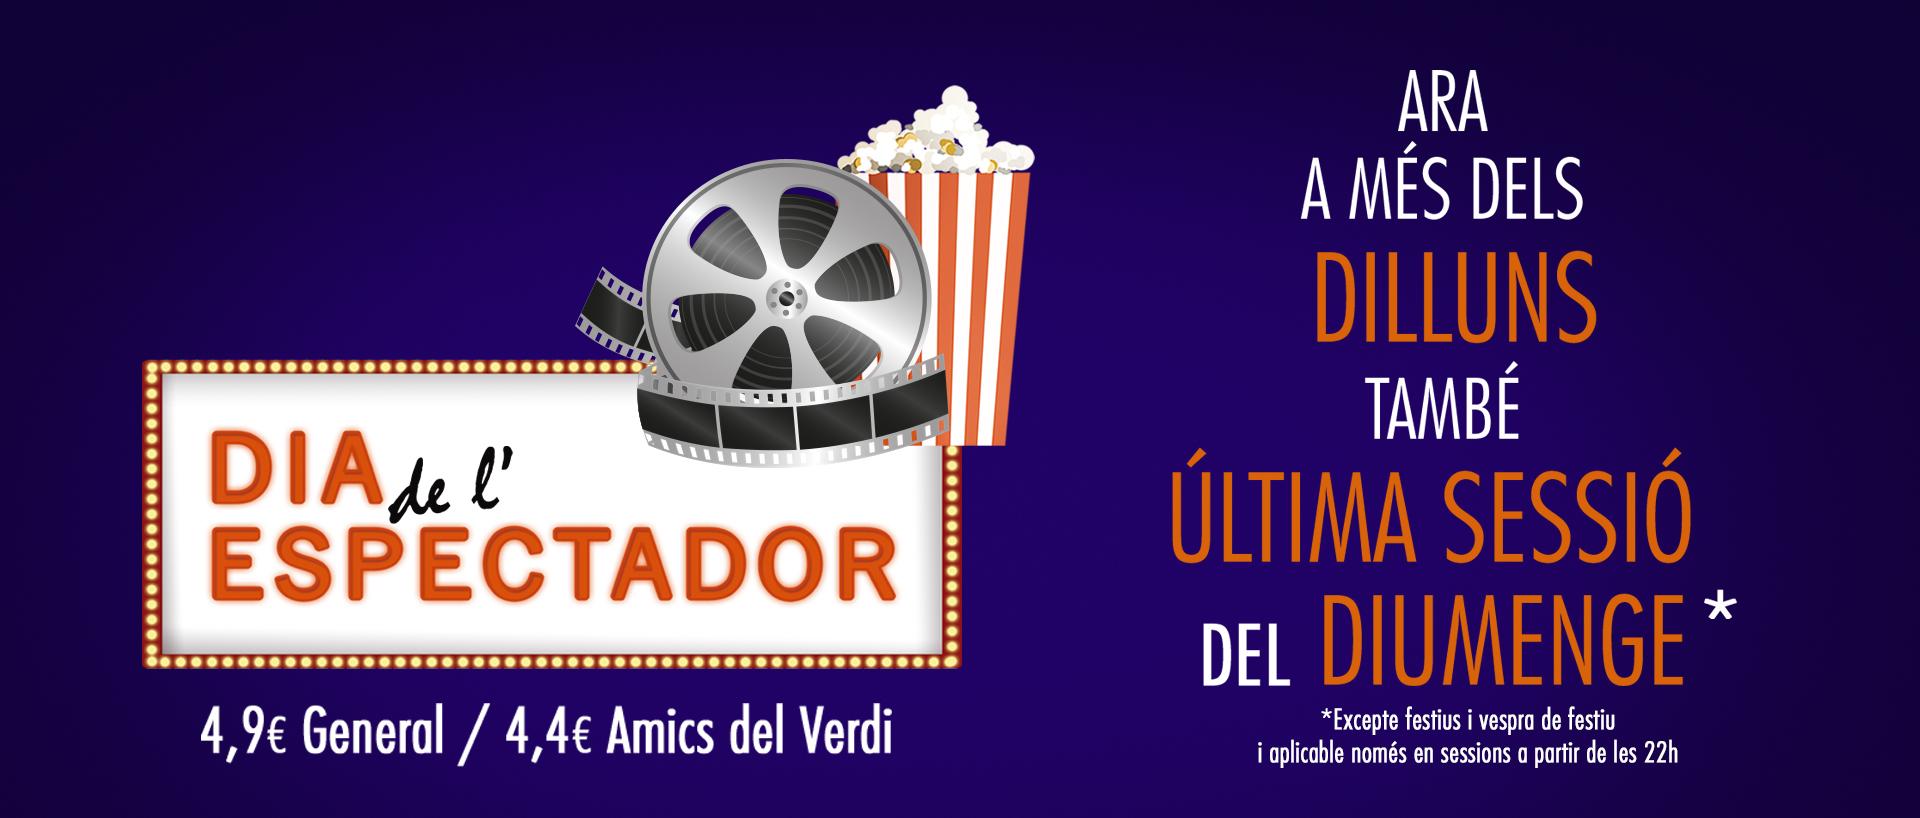 Verdi_Promos_dia_espectador_ca.jpg